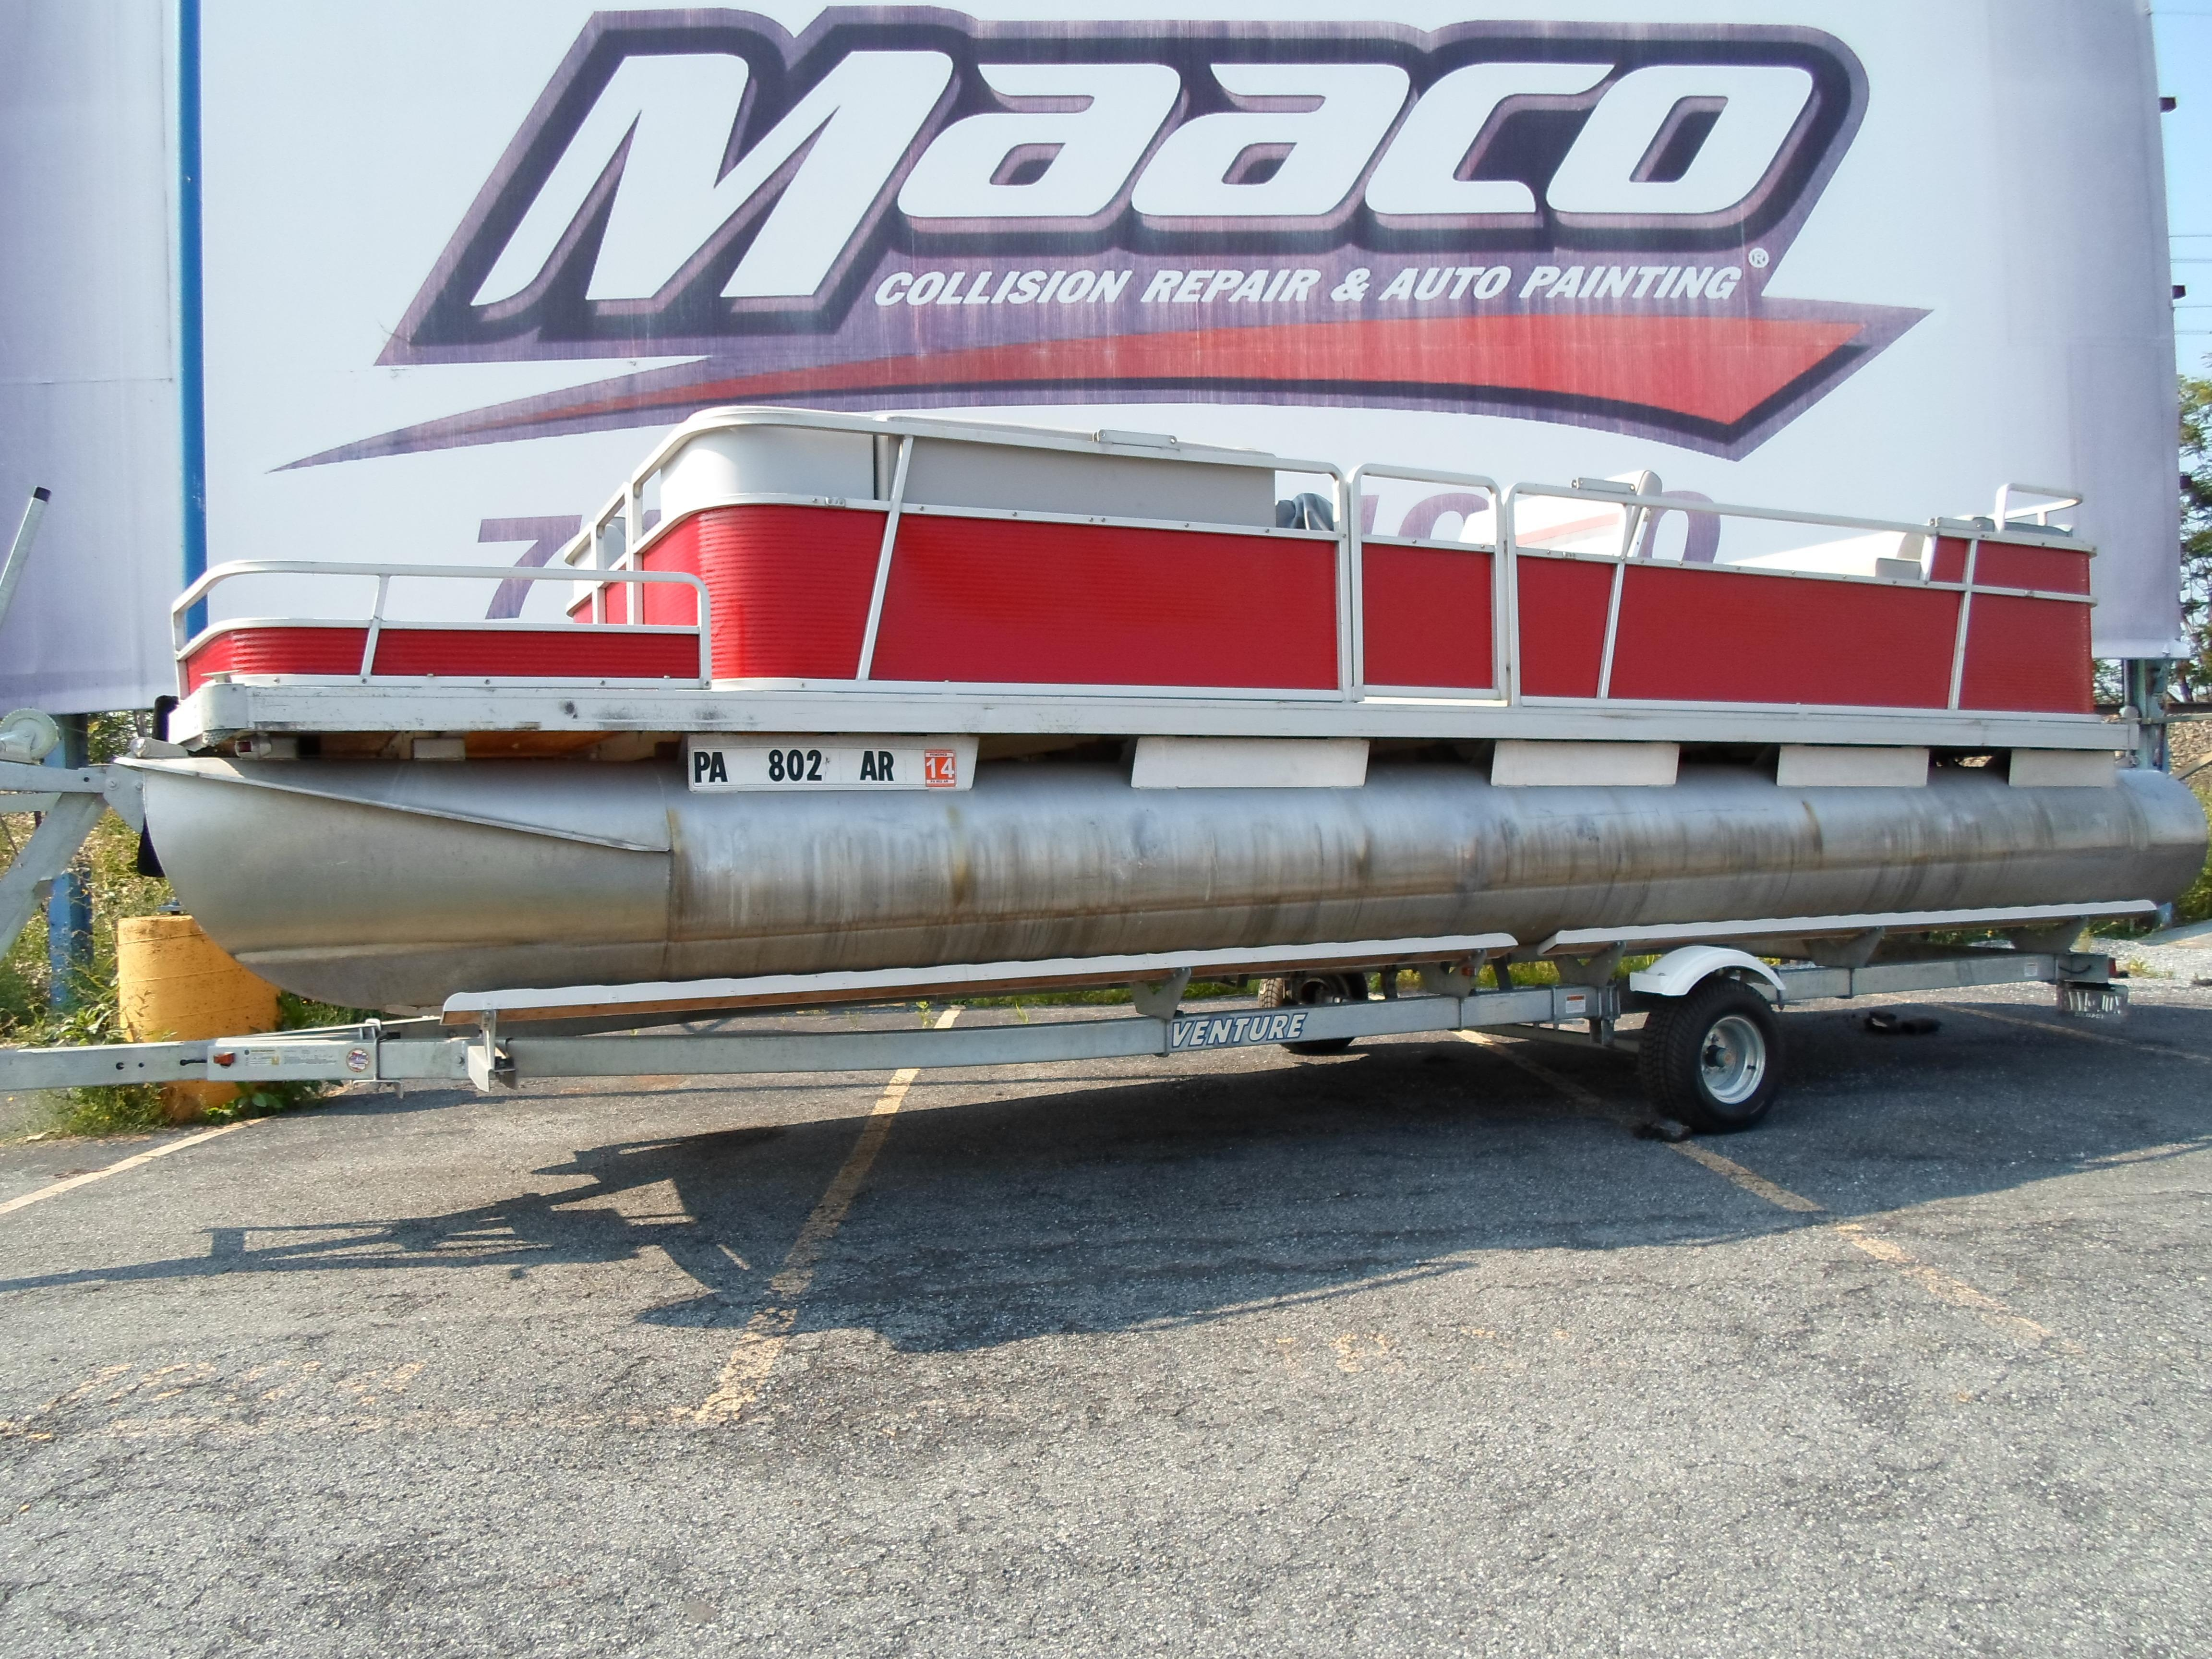 Maaco Collision Repair & Auto Painting image 9